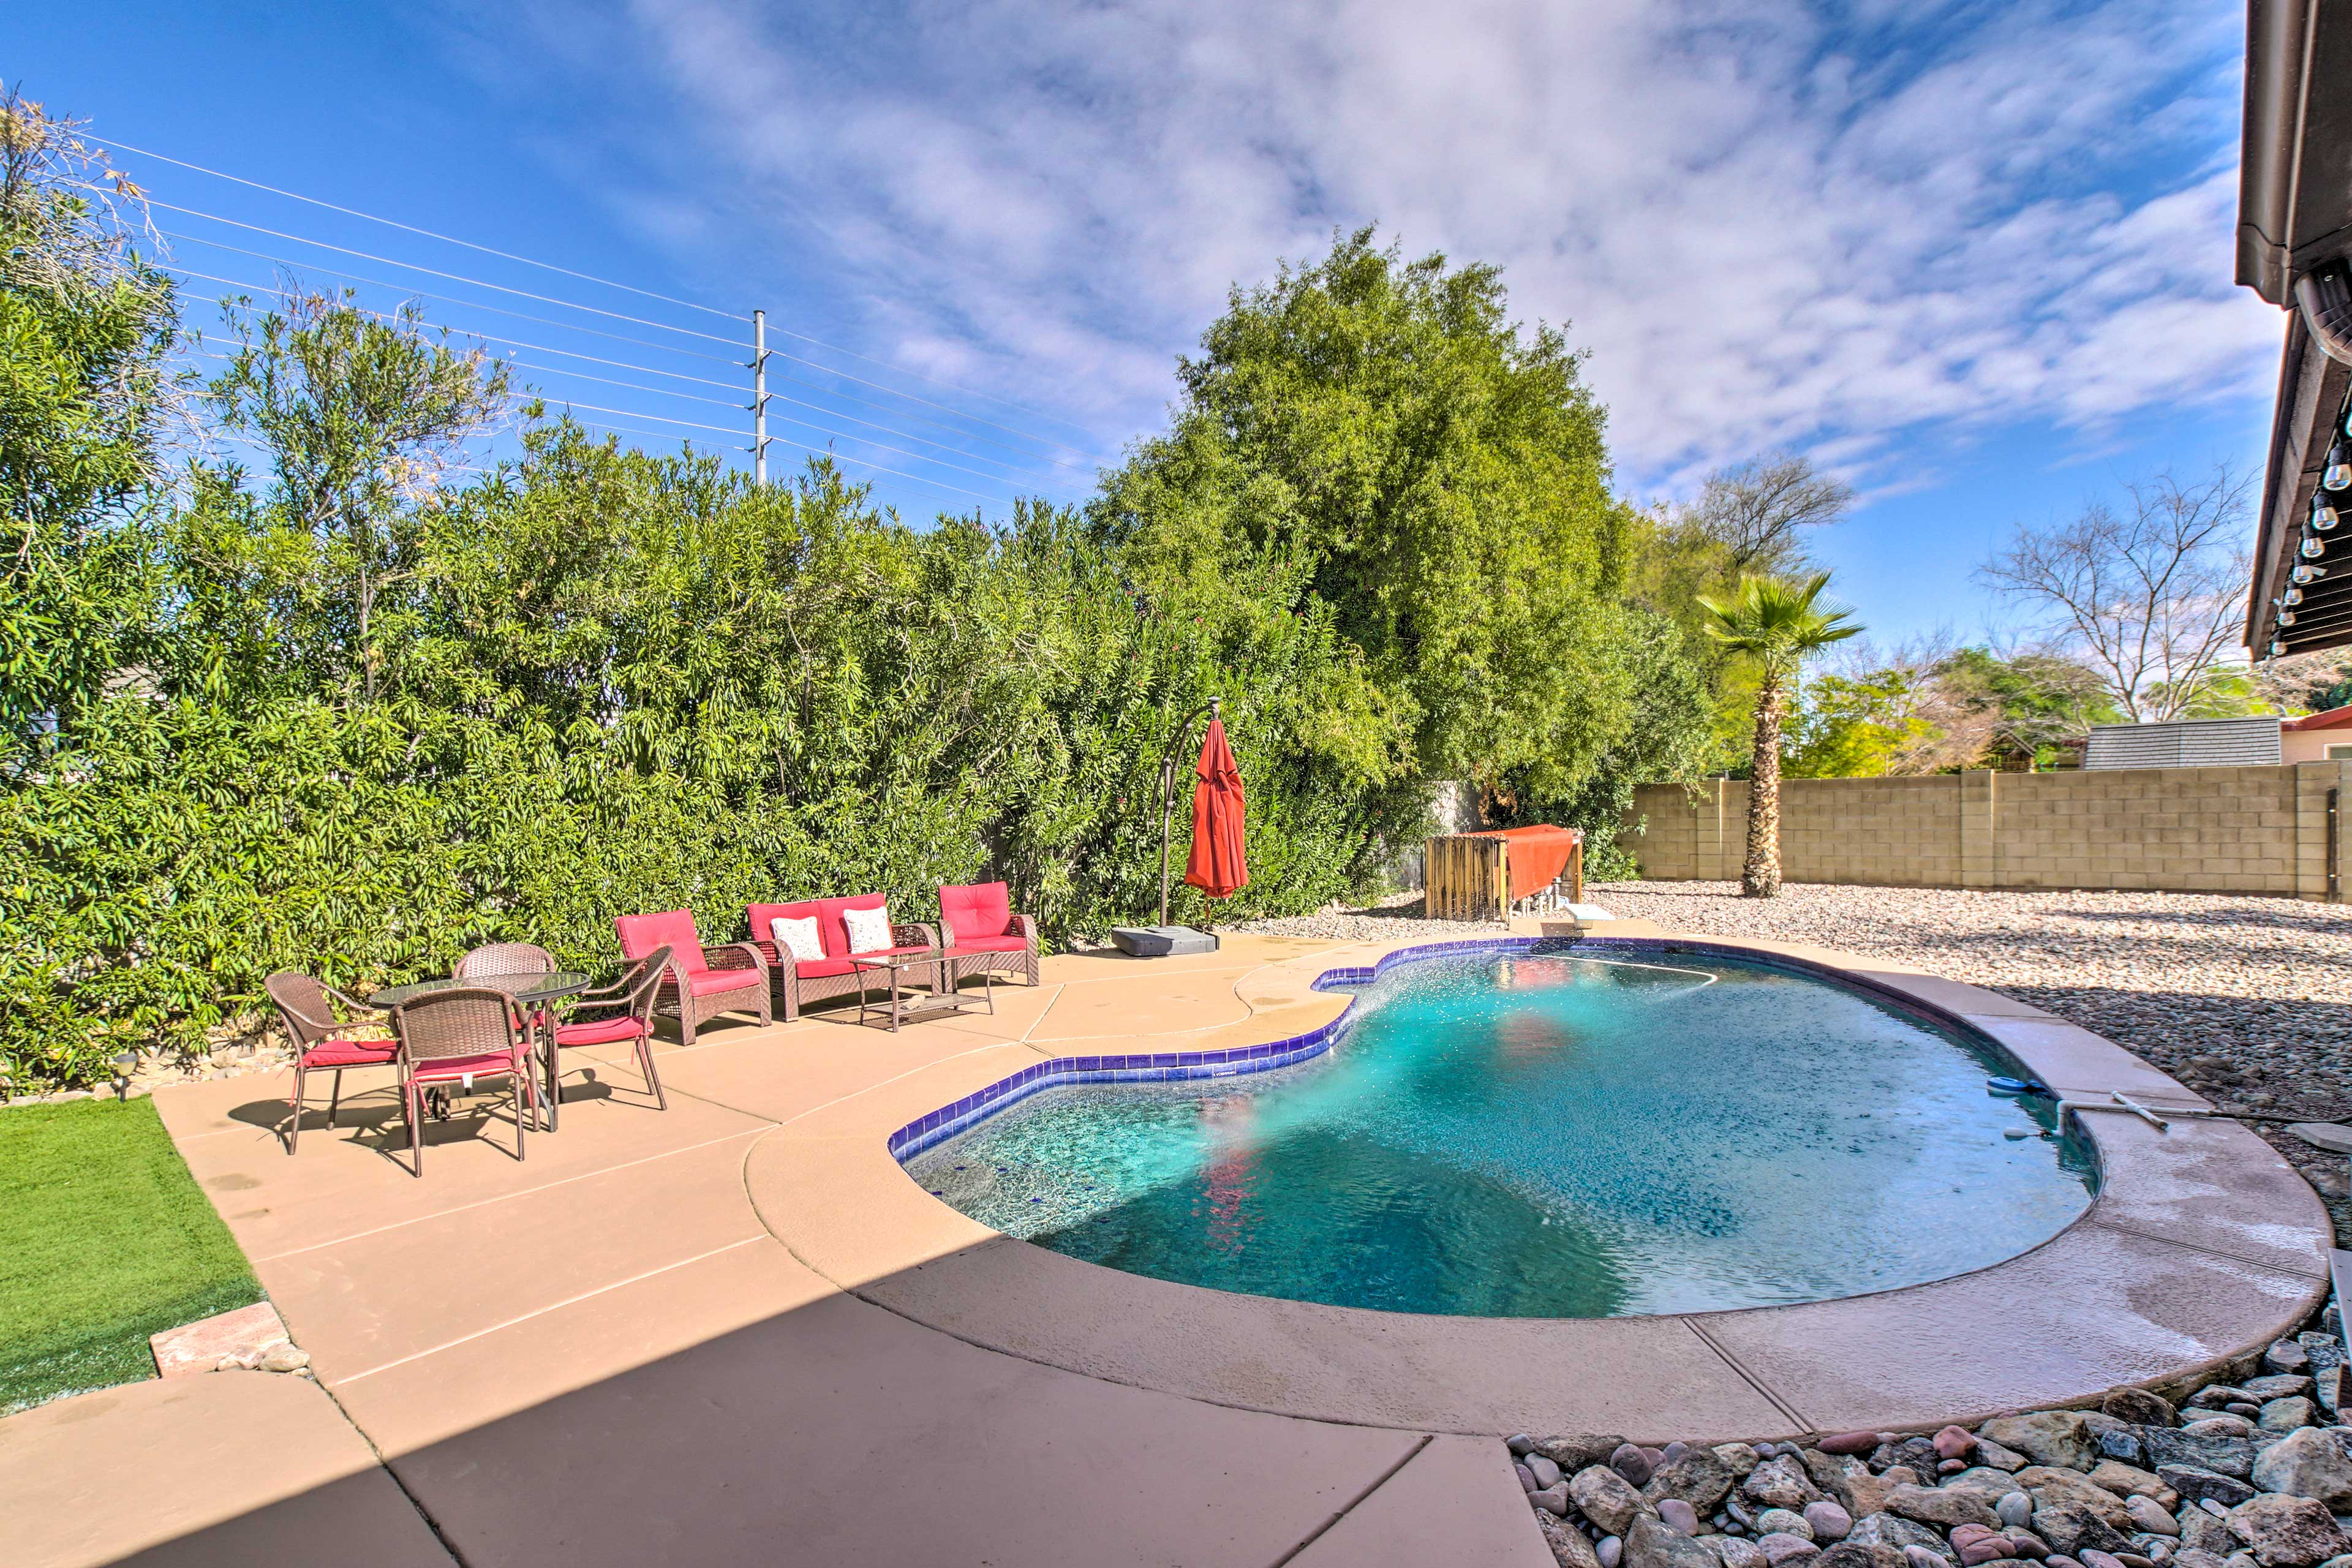 Private Backyard | Lounge Area